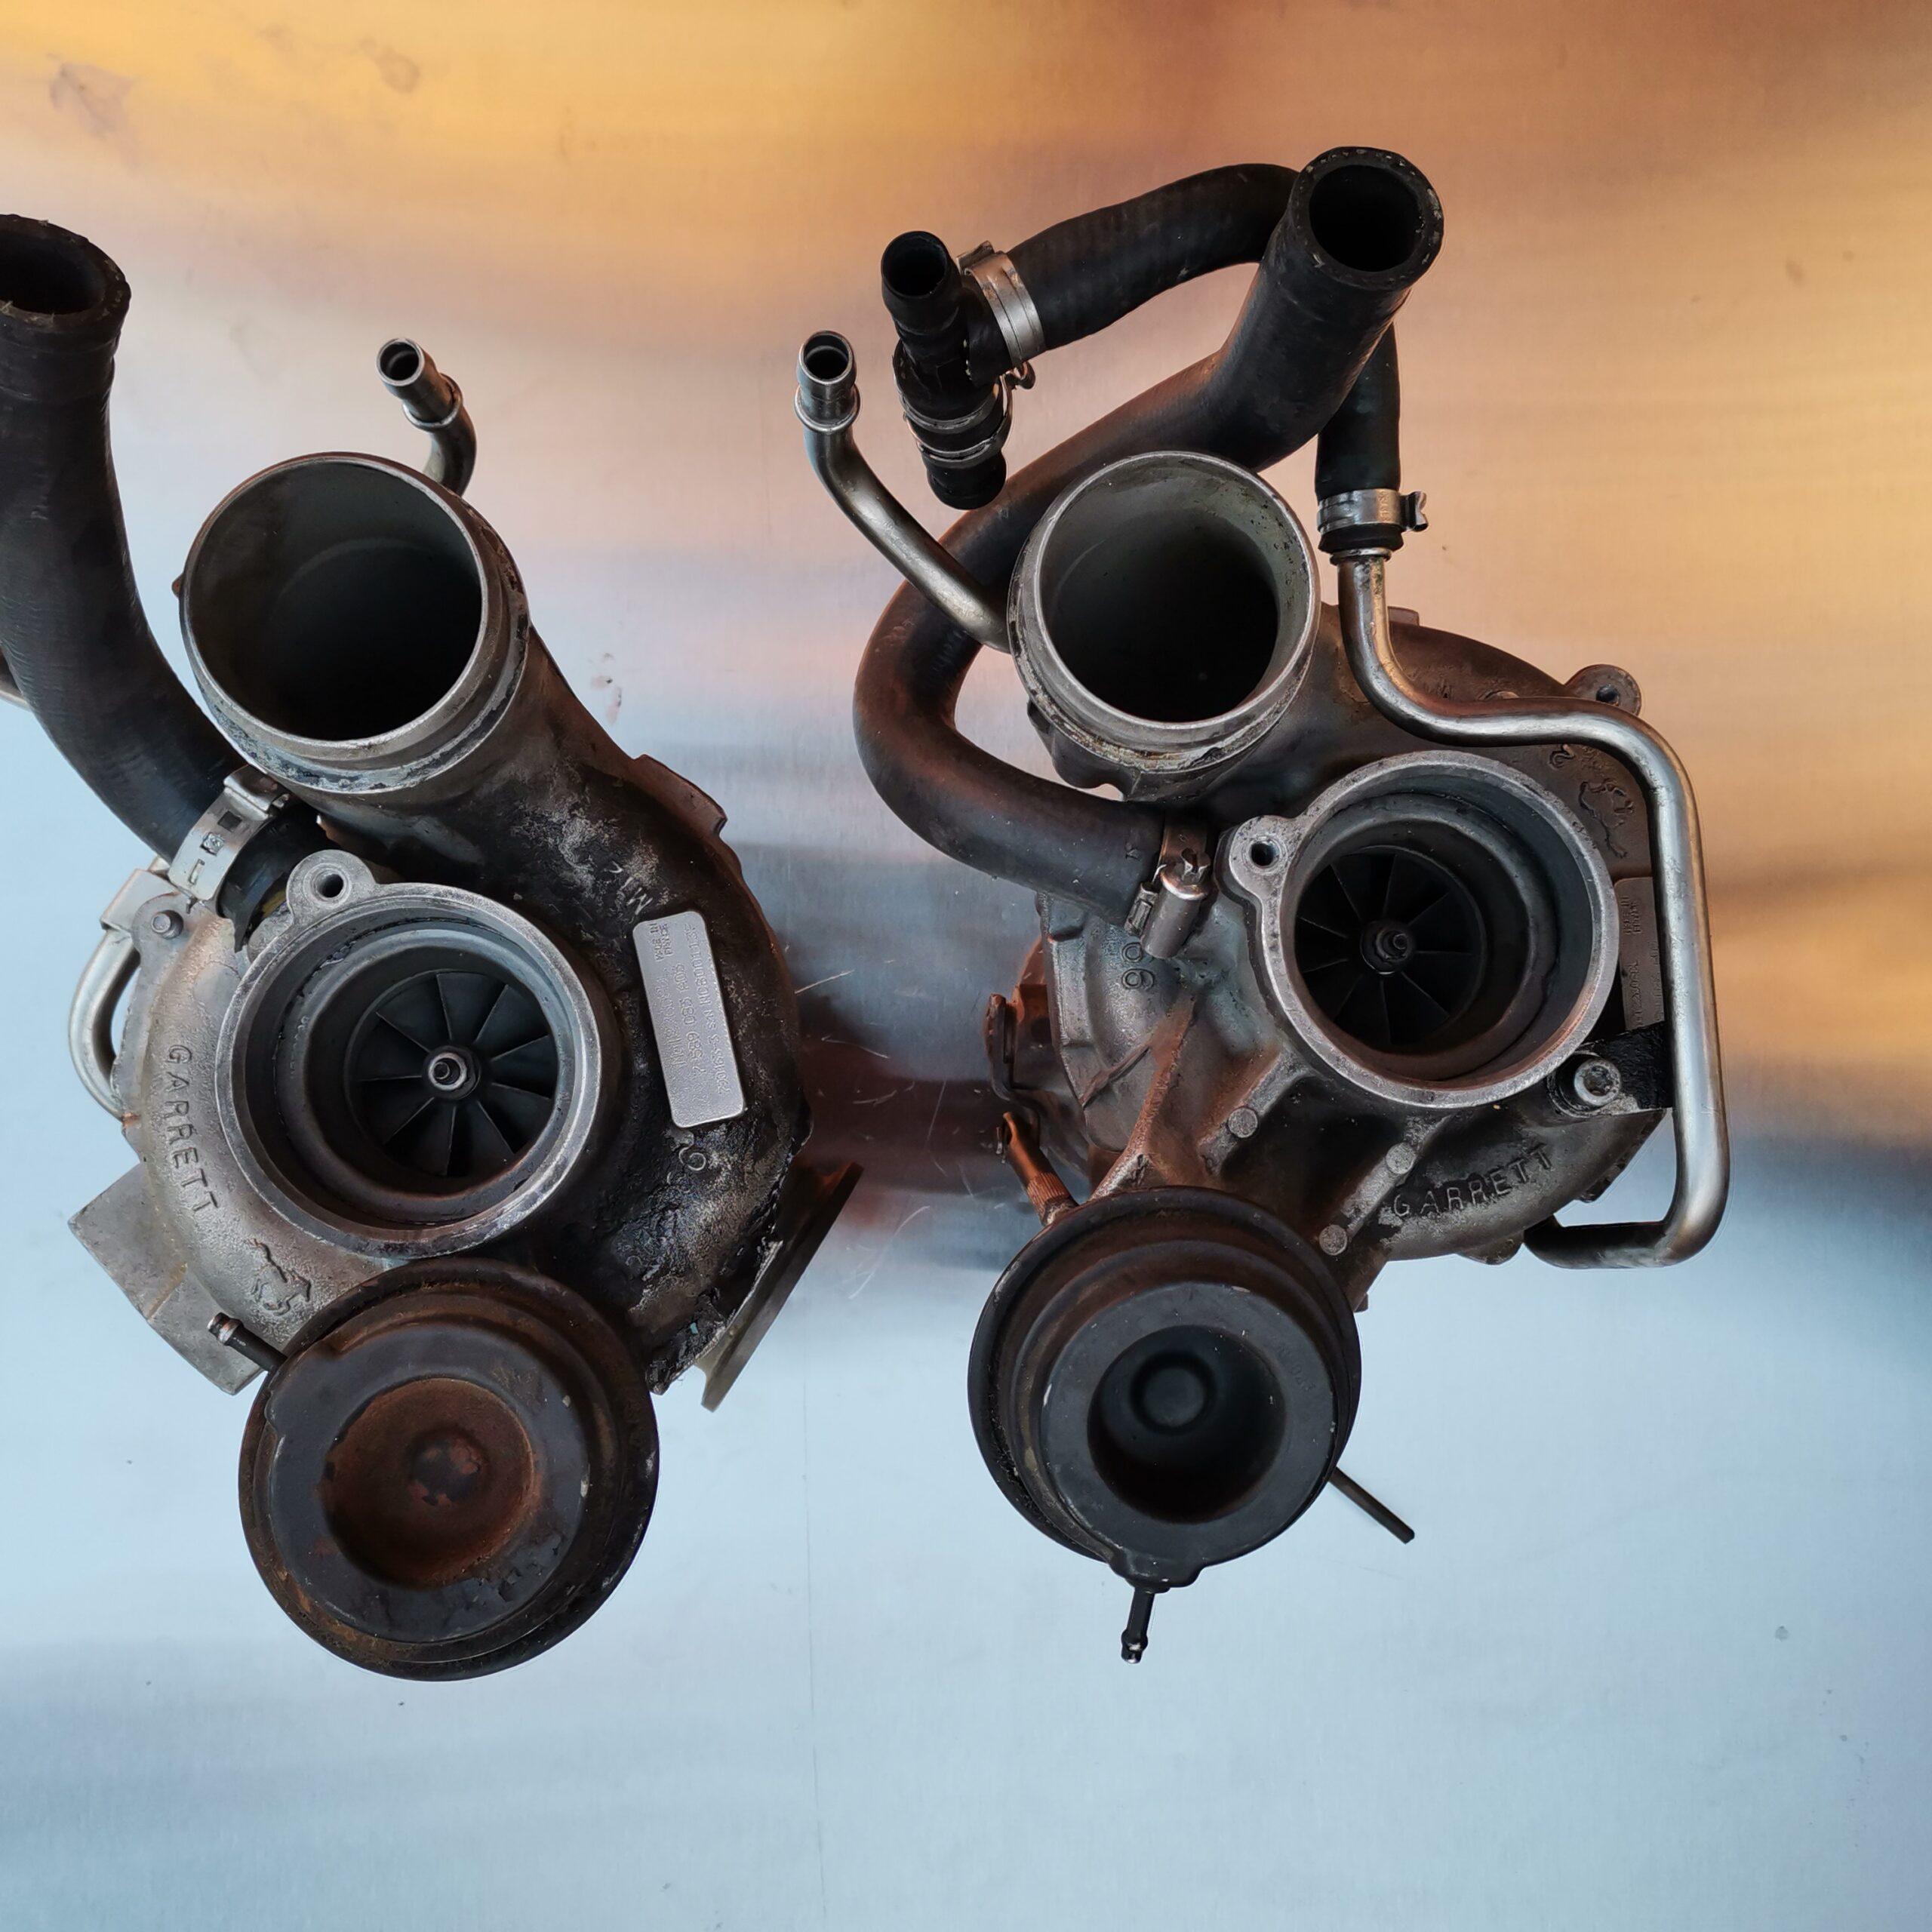 Турбины BMW X5 E70 на восстановление